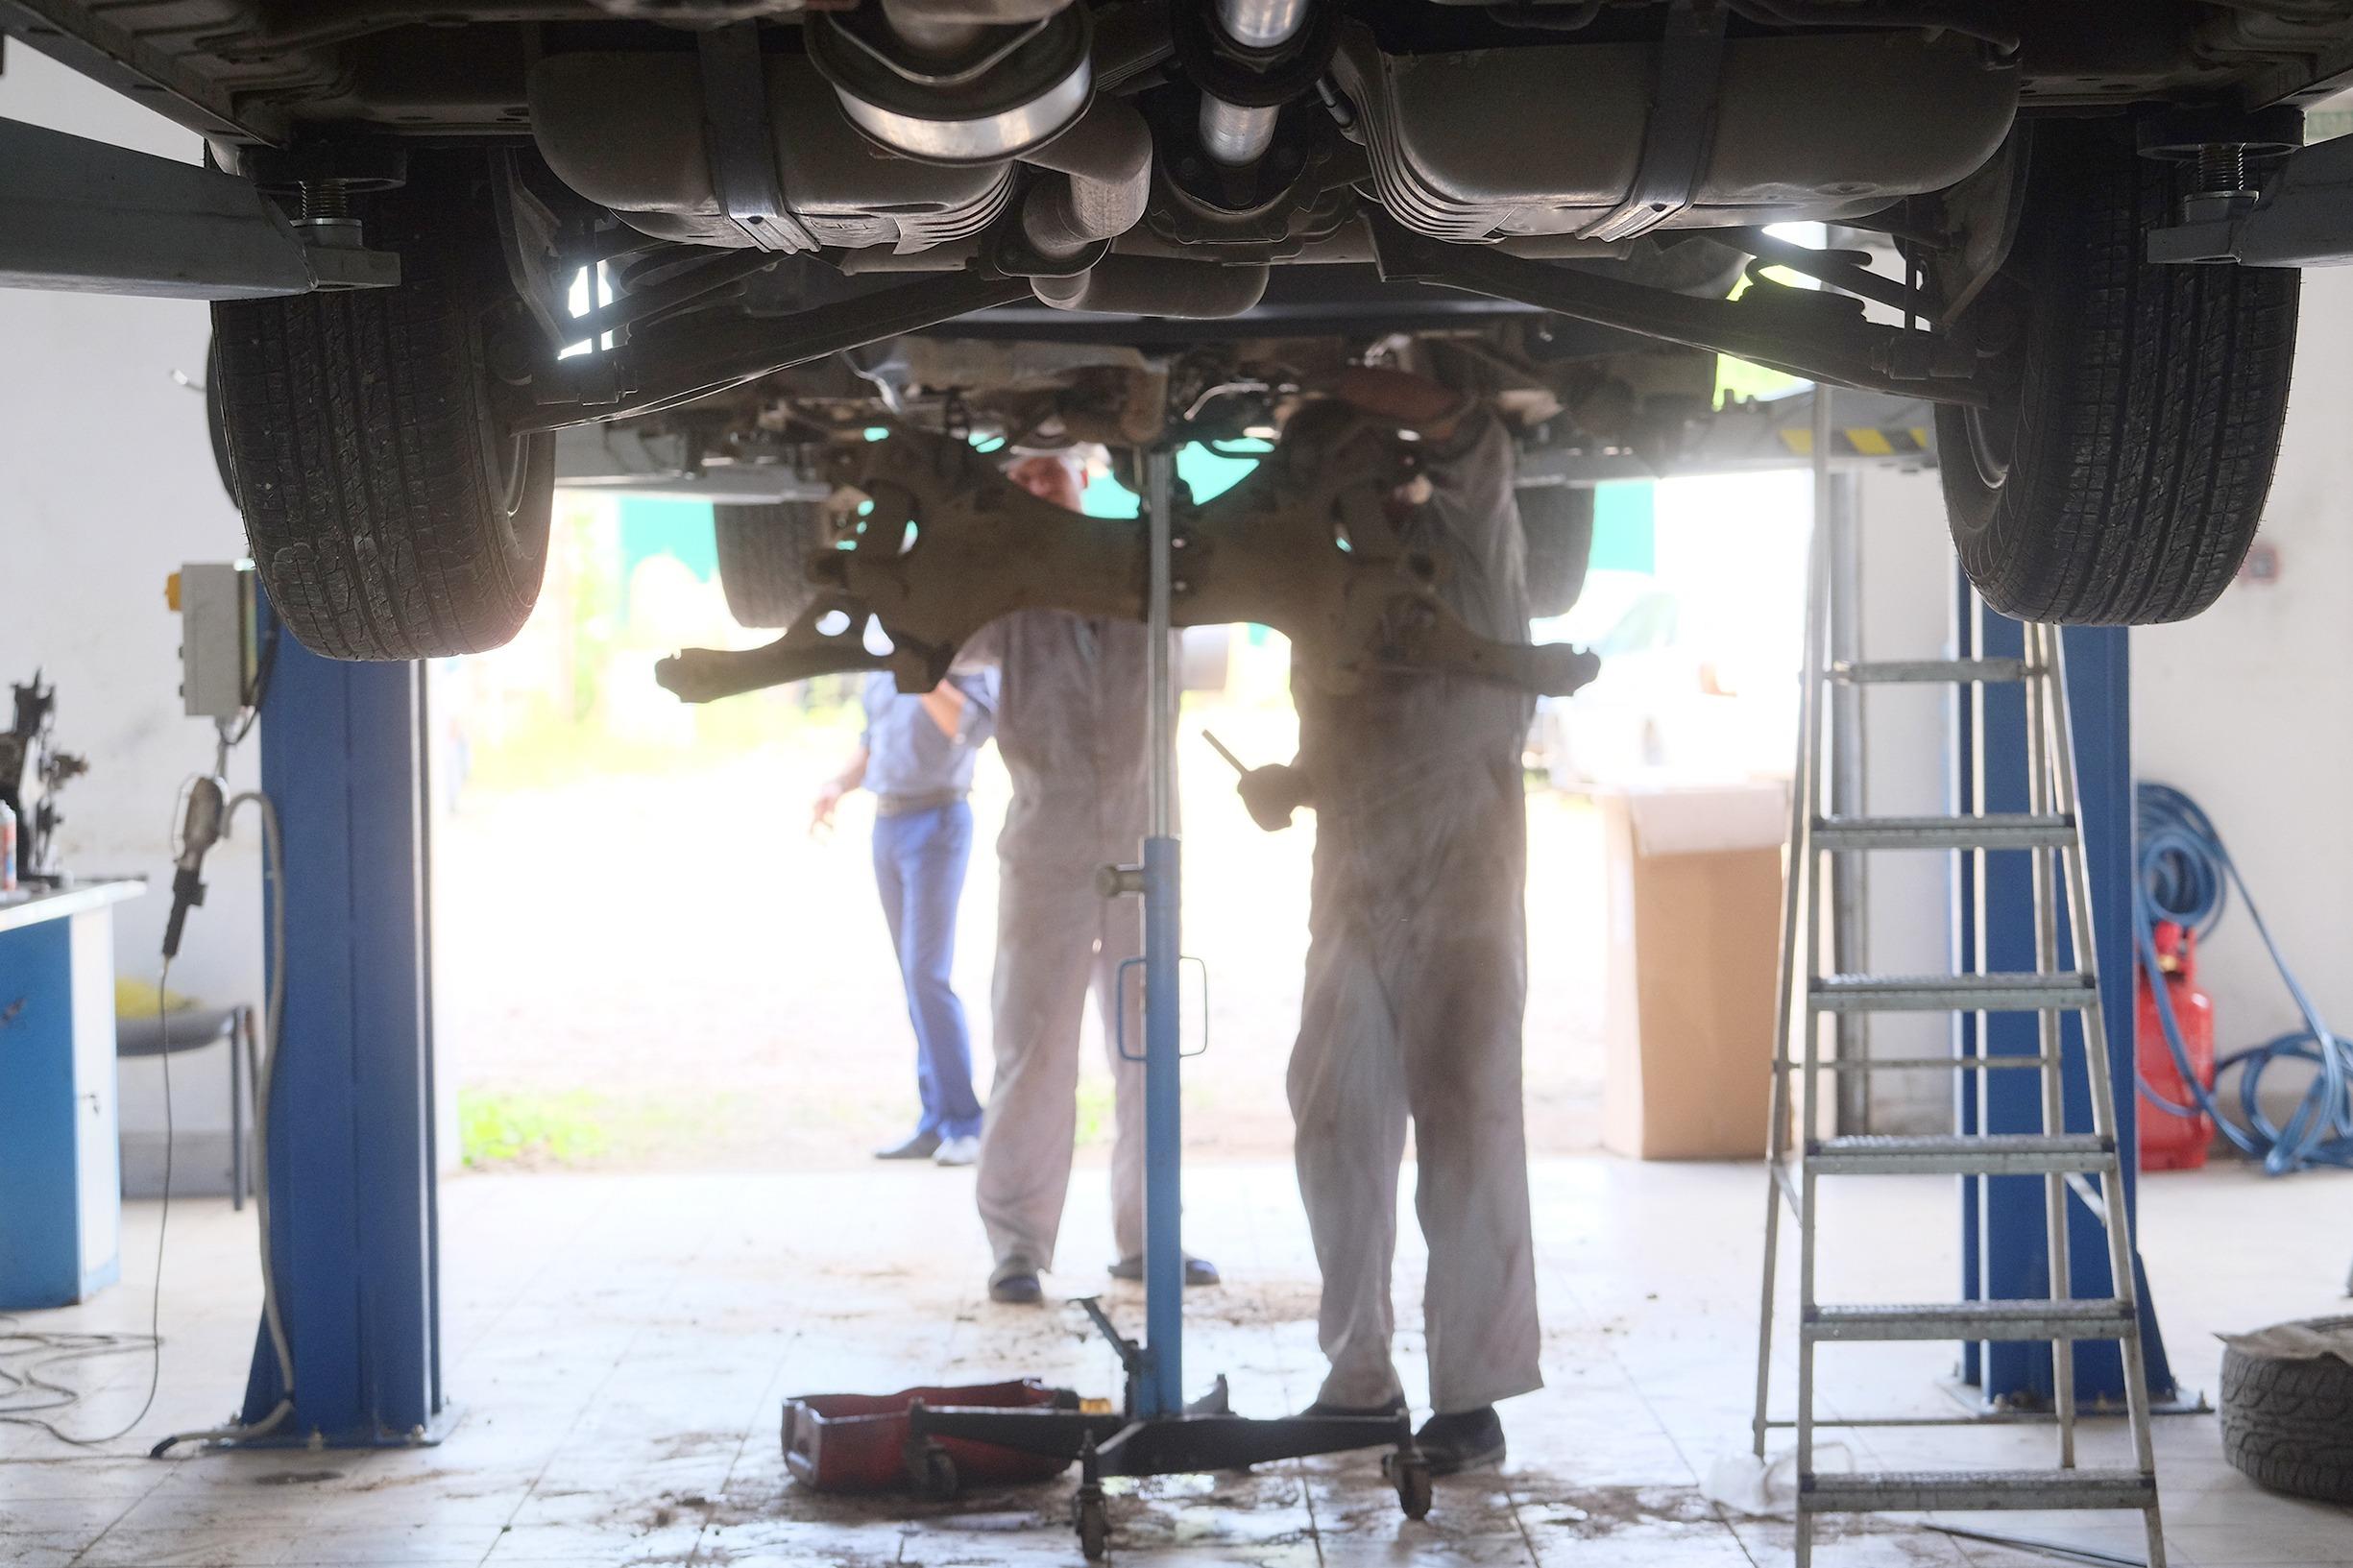 Interior of a car repair station